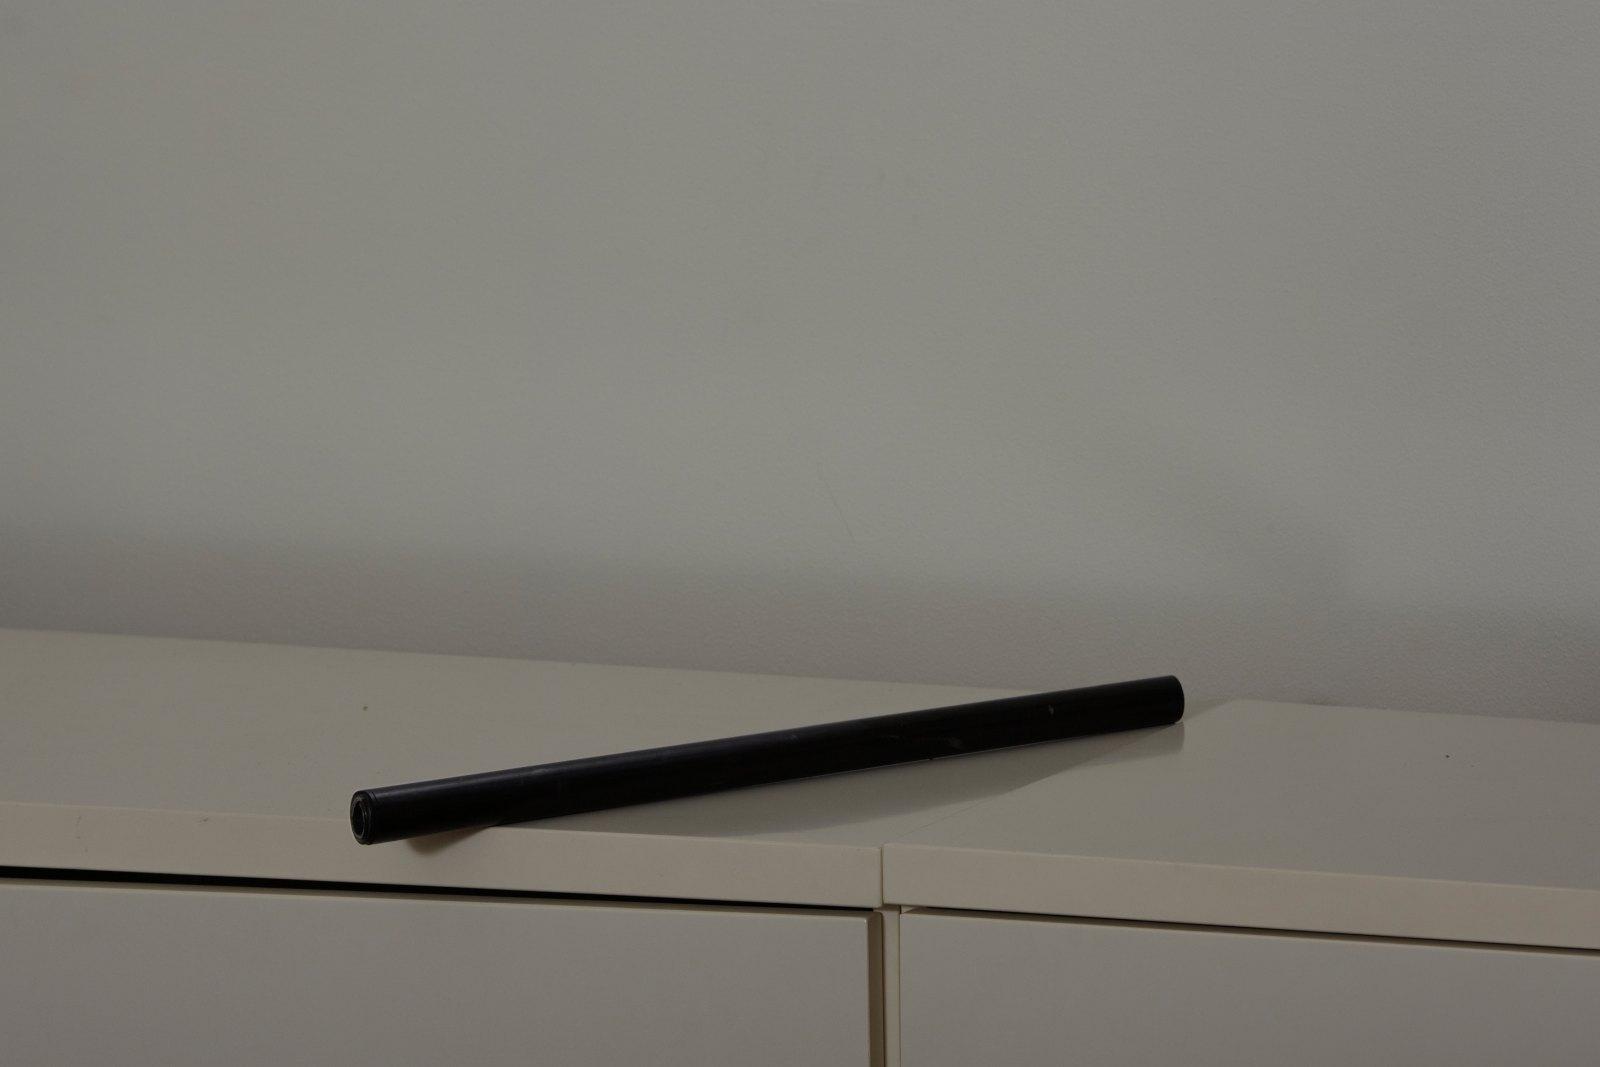 Blunt object, 2010, giclée print, 67,8 x 96 cm